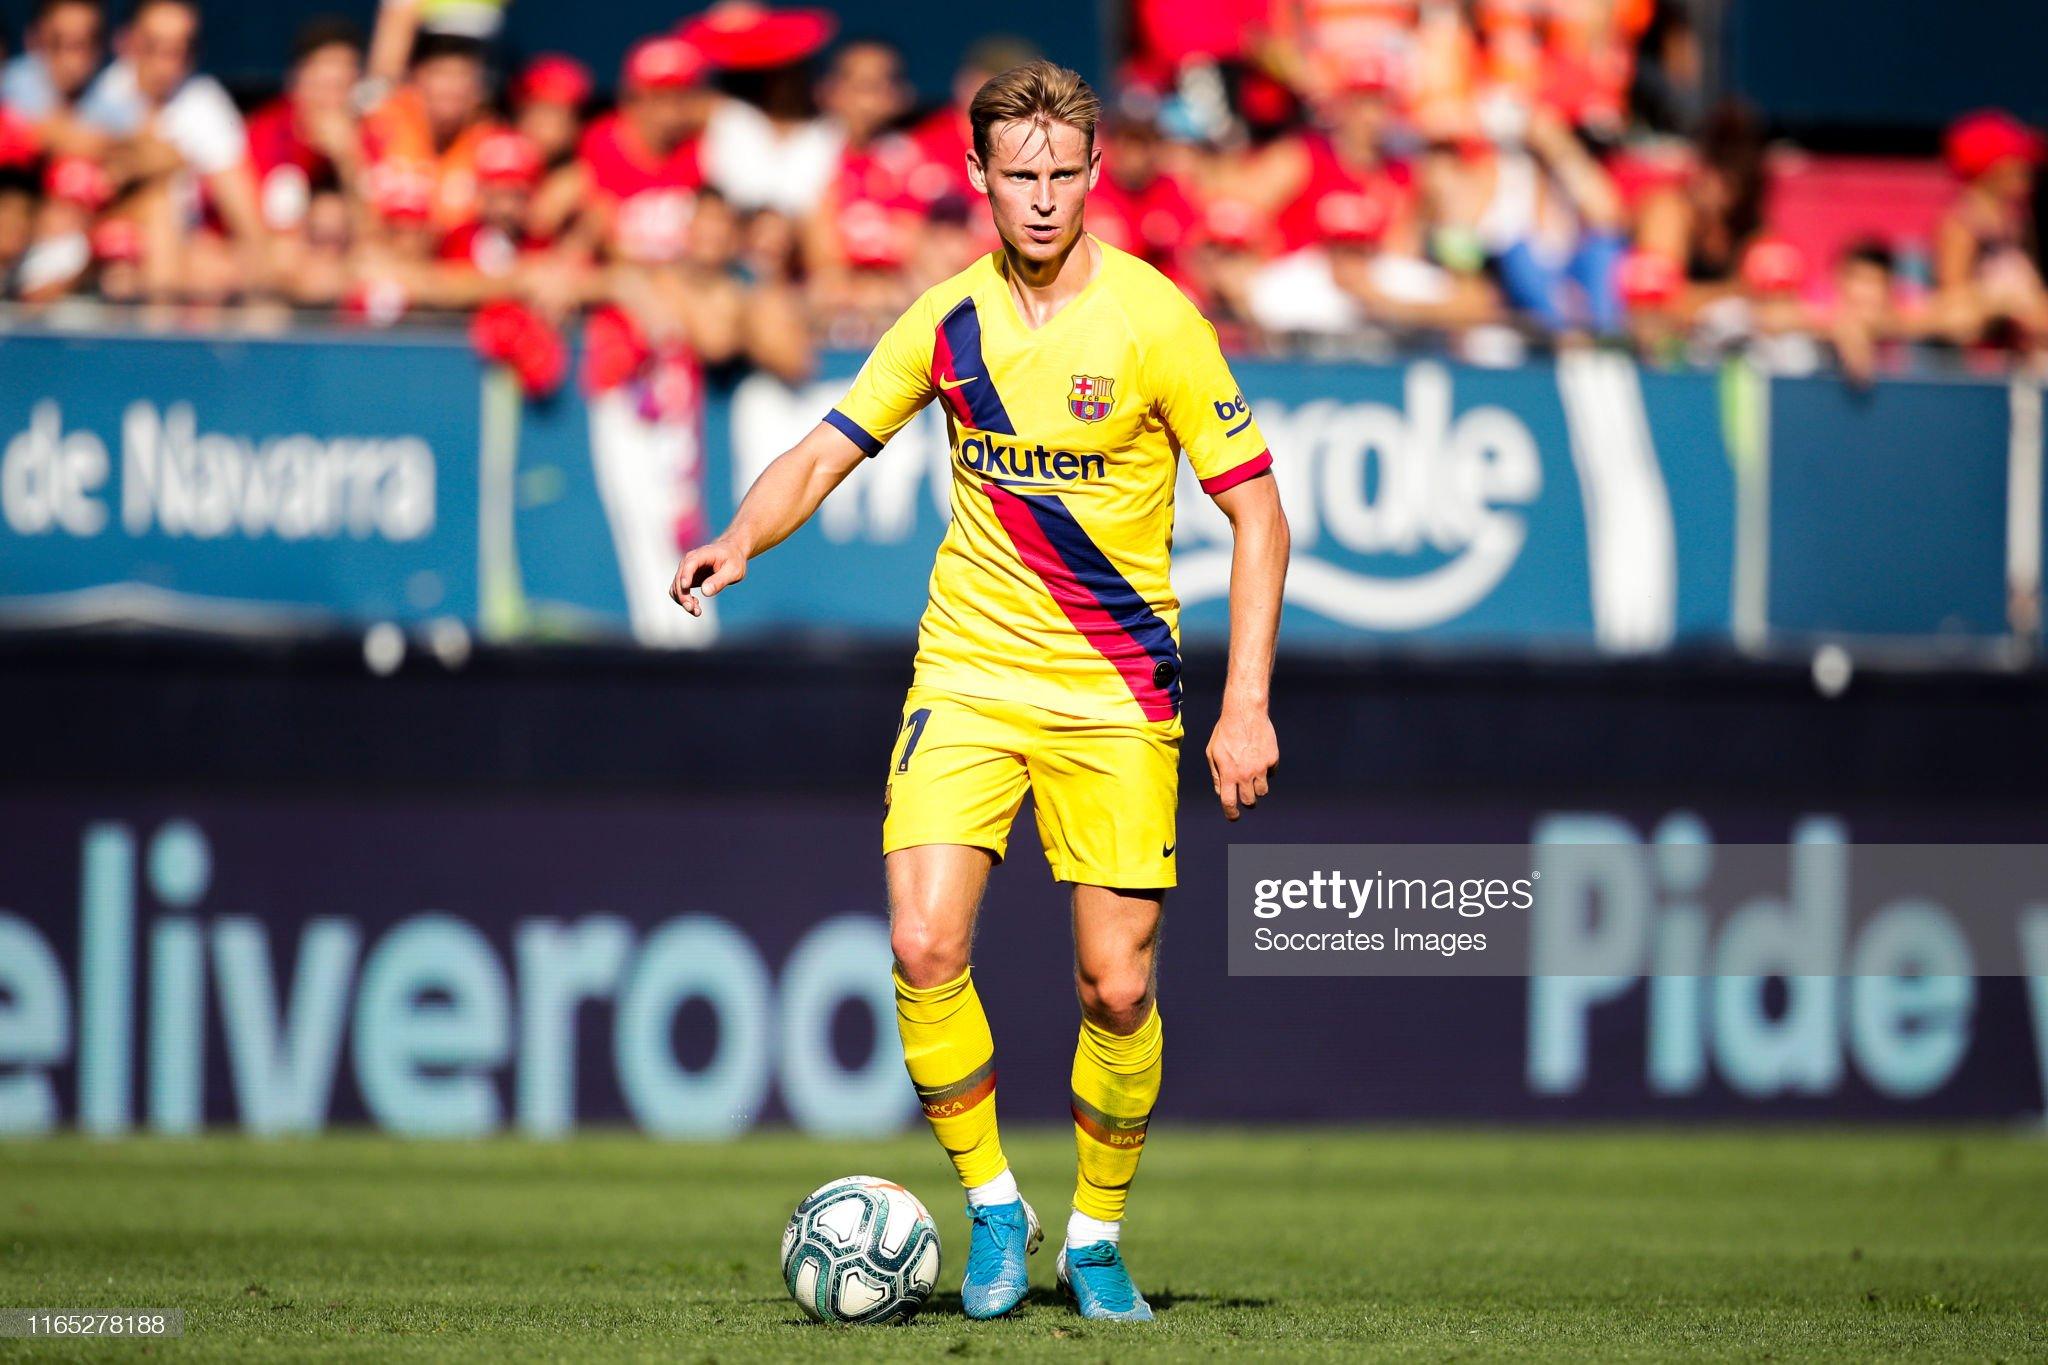 صور مباراة : أوساسونا - برشلونة 2-2 ( 31-08-2019 )  Frenkie-de-jong-of-fc-barcelona-during-the-la-liga-santander-match-picture-id1165278188?s=2048x2048